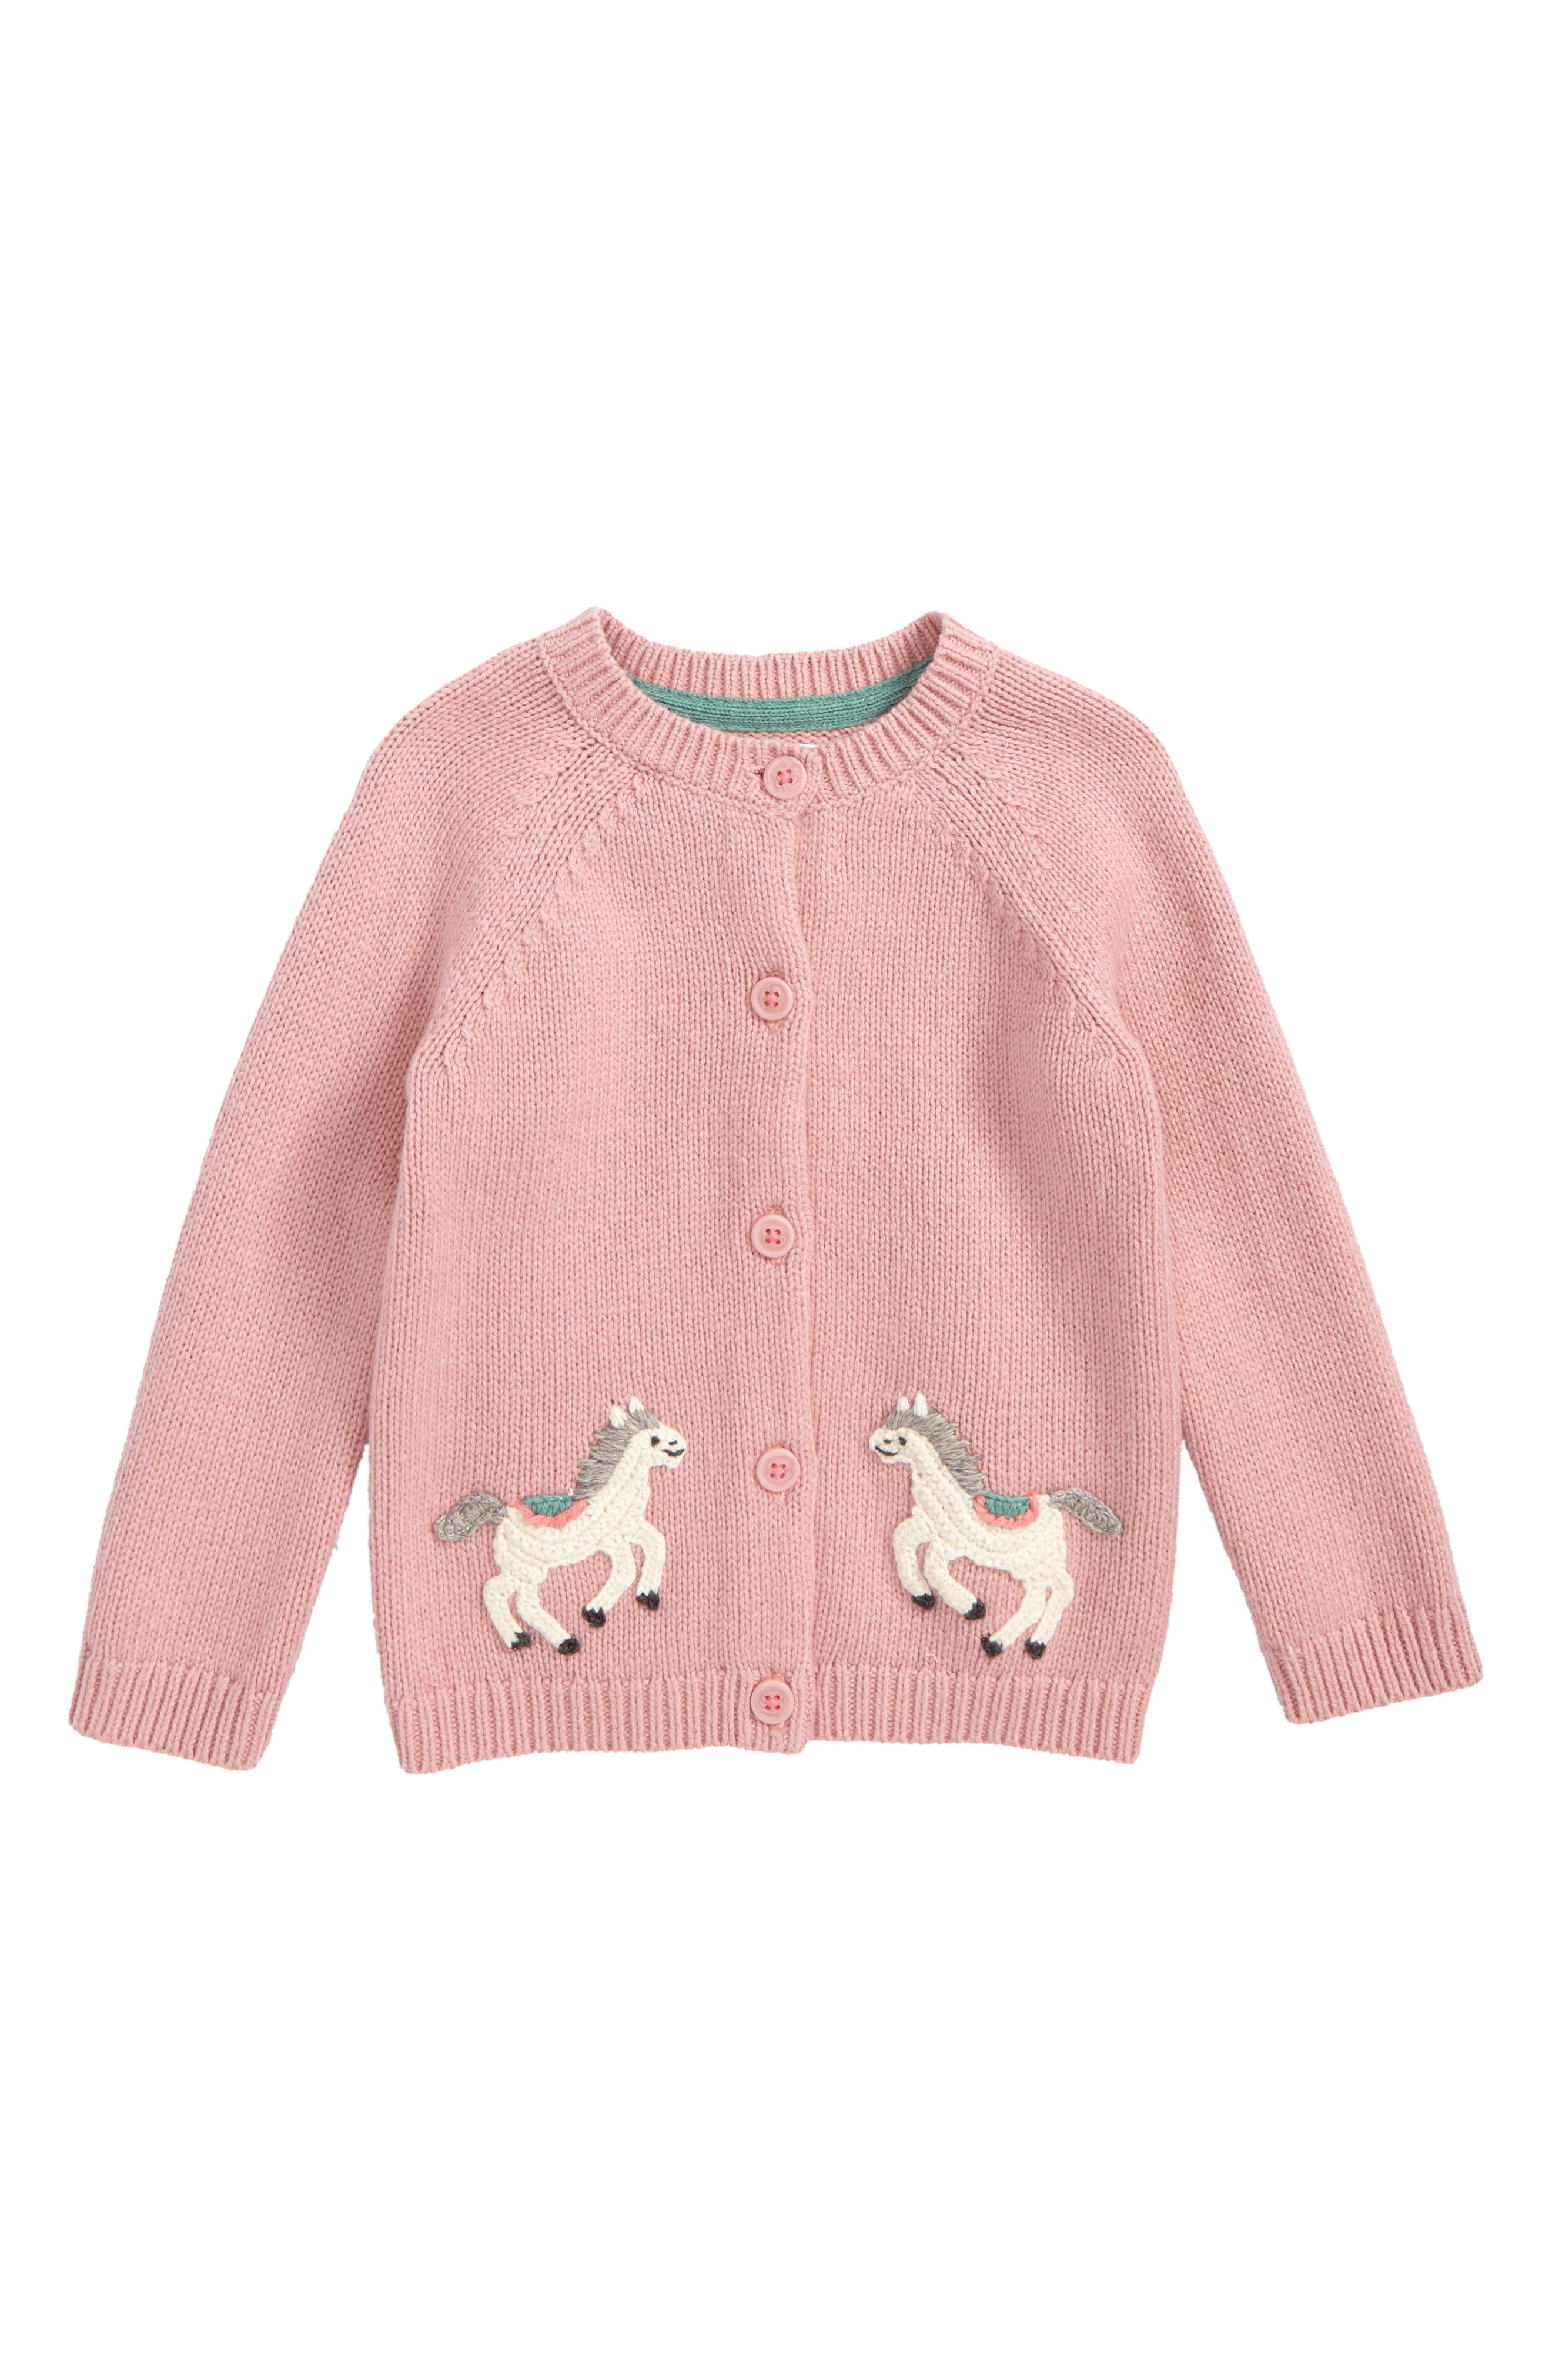 Crochet Pony Cardigan,                         Main,                         color, Pink Almond Blossom